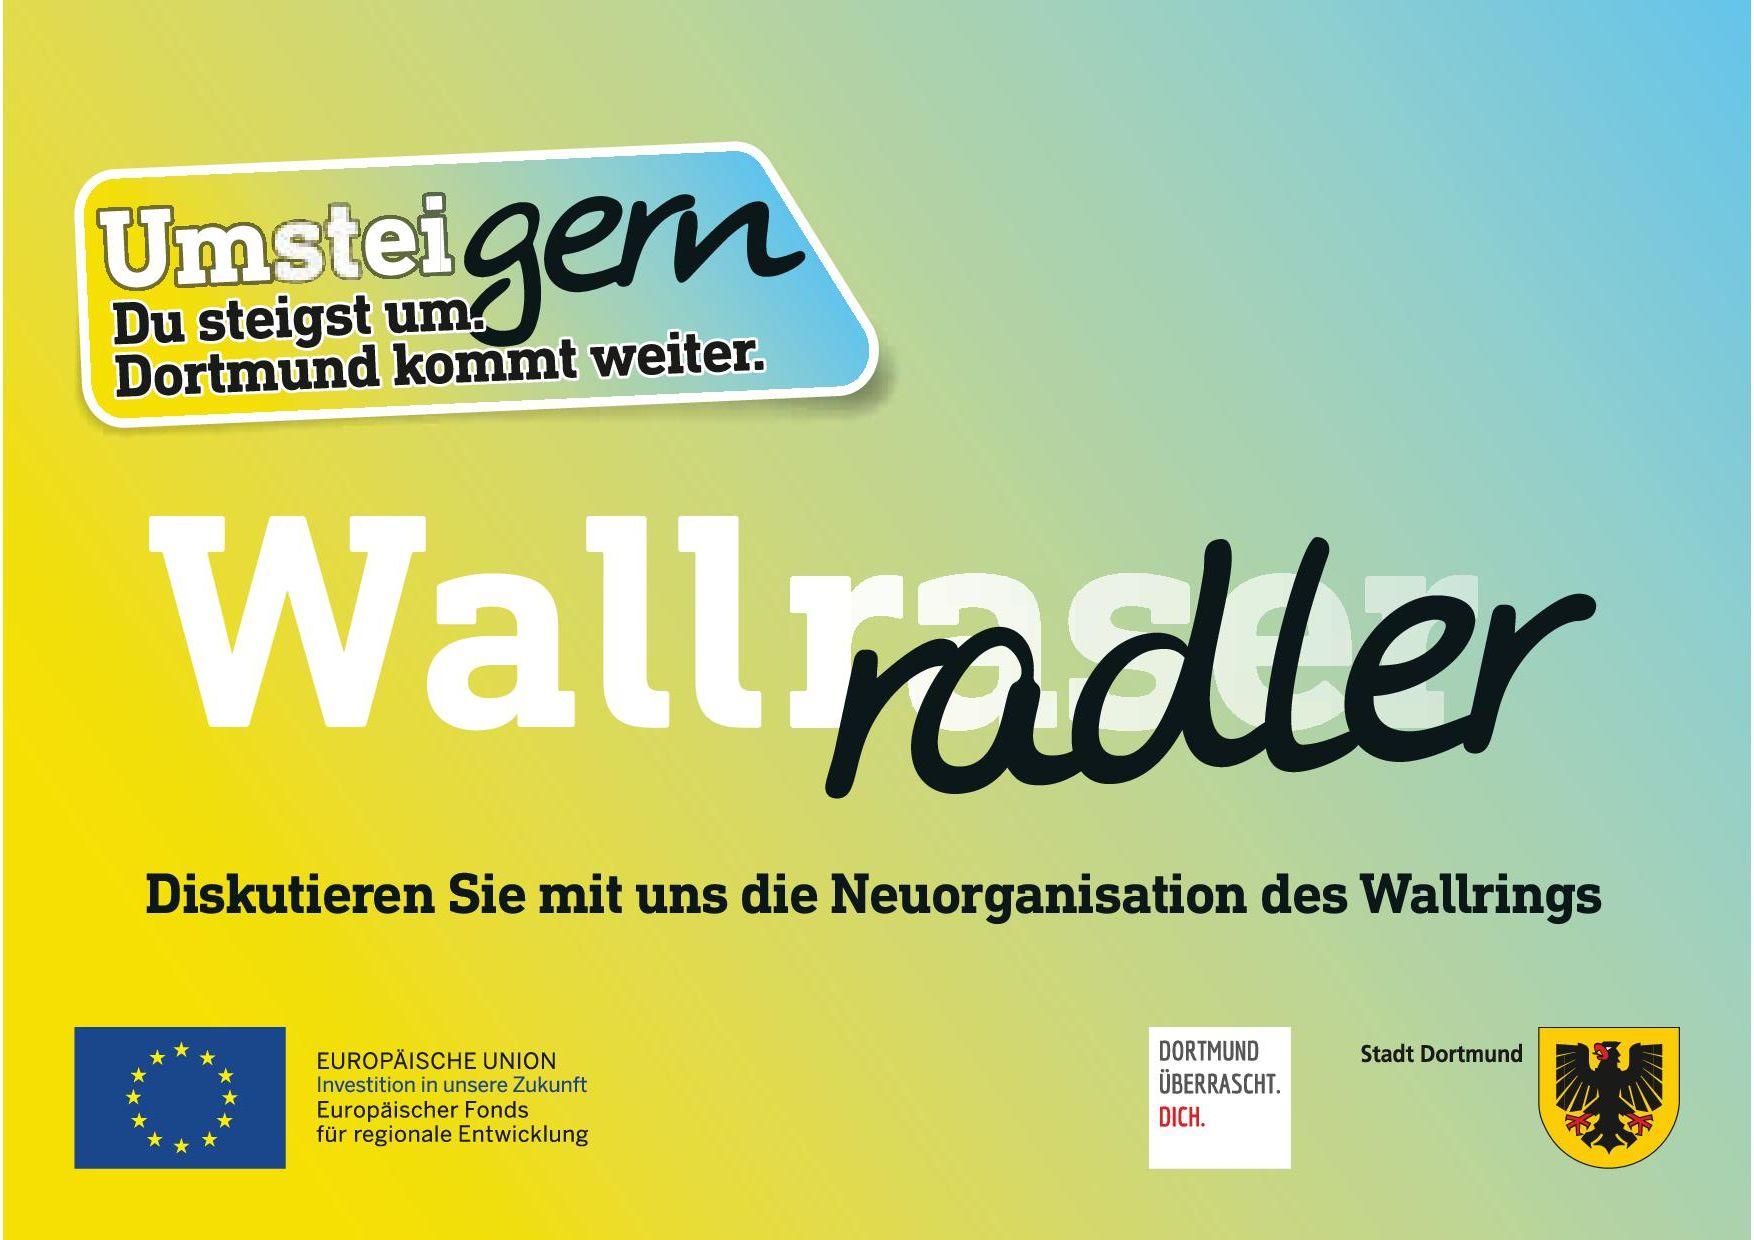 "Kampagnenmotiv zum Digitalen Dialog Wallring mit Text ""Wallraser"" wird zu ""Wallradler"""